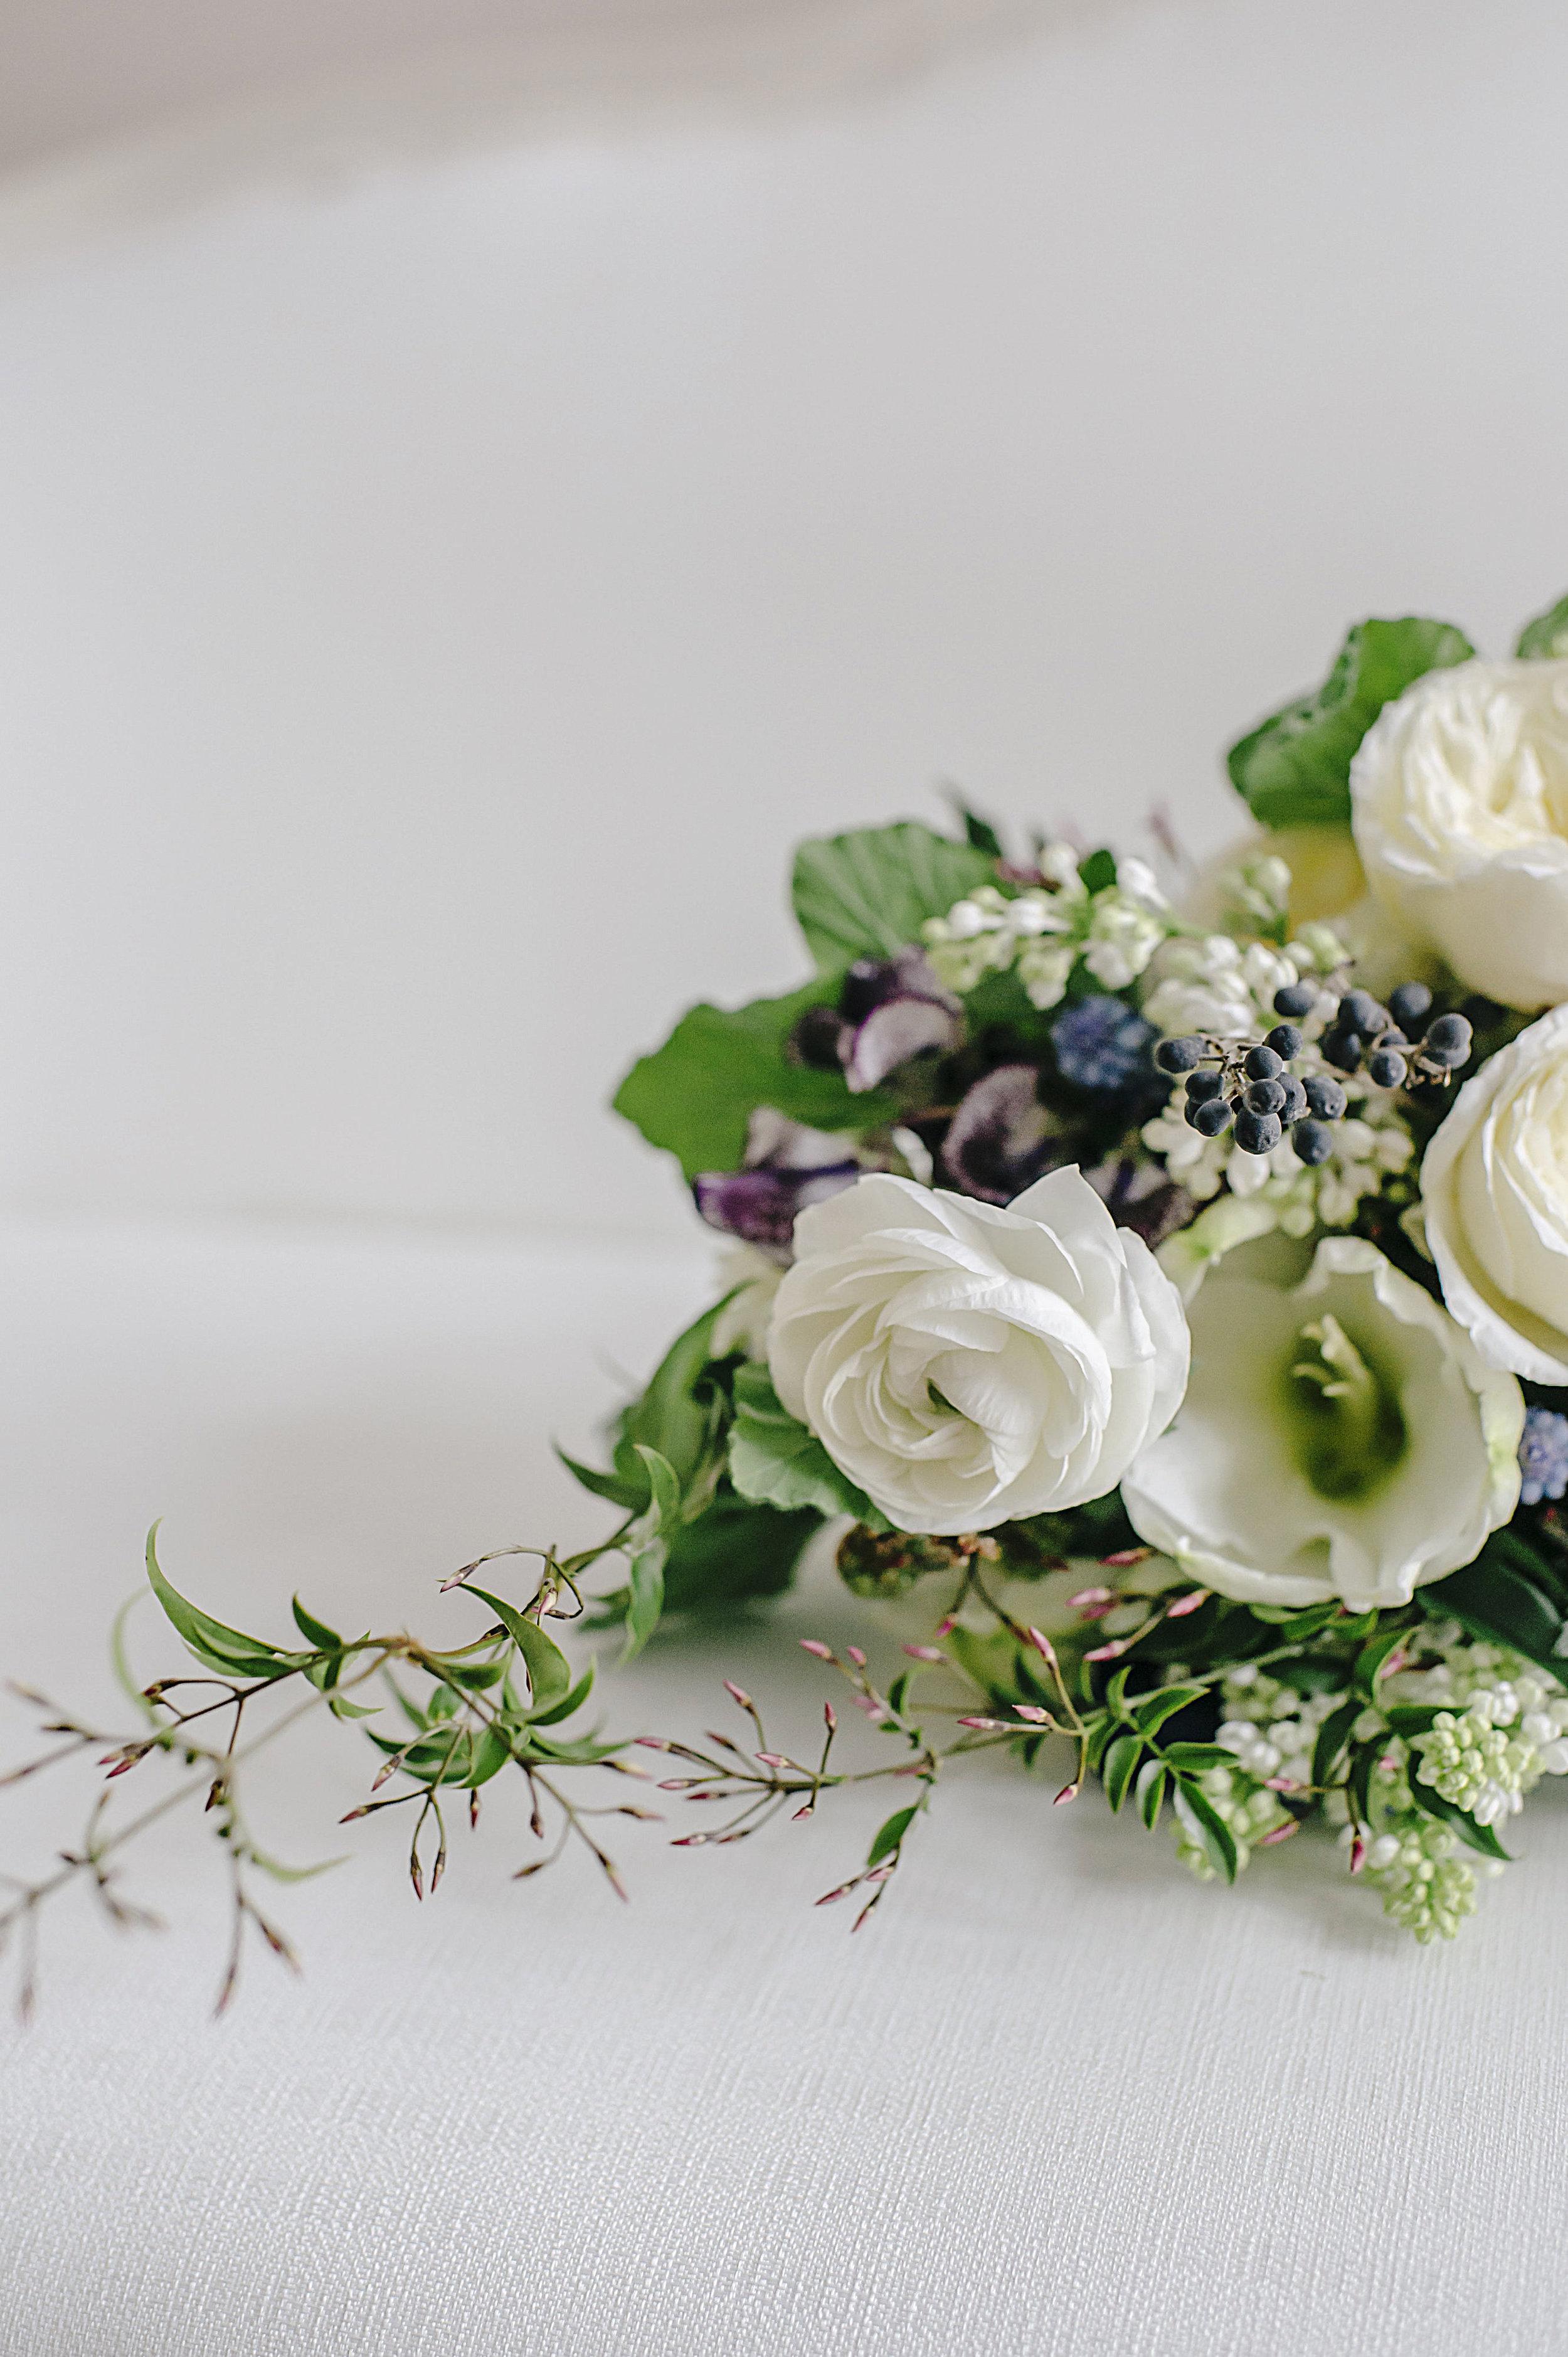 floral design wedding flowers